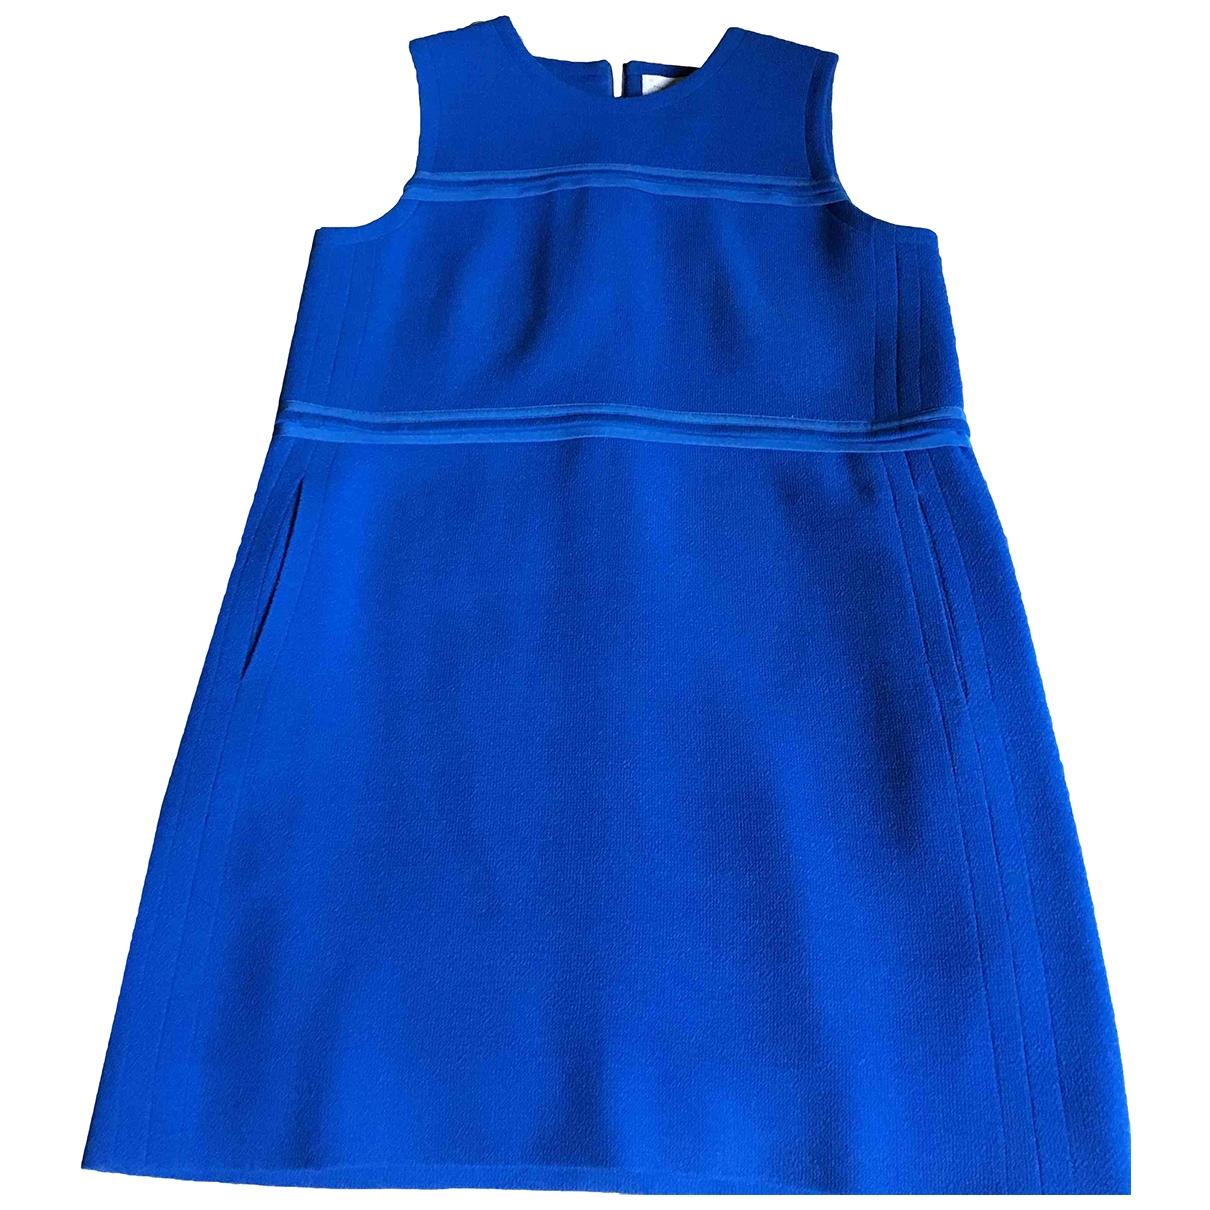 Victoria, Victoria Beckham \N Blue Wool dress for Women 12 UK